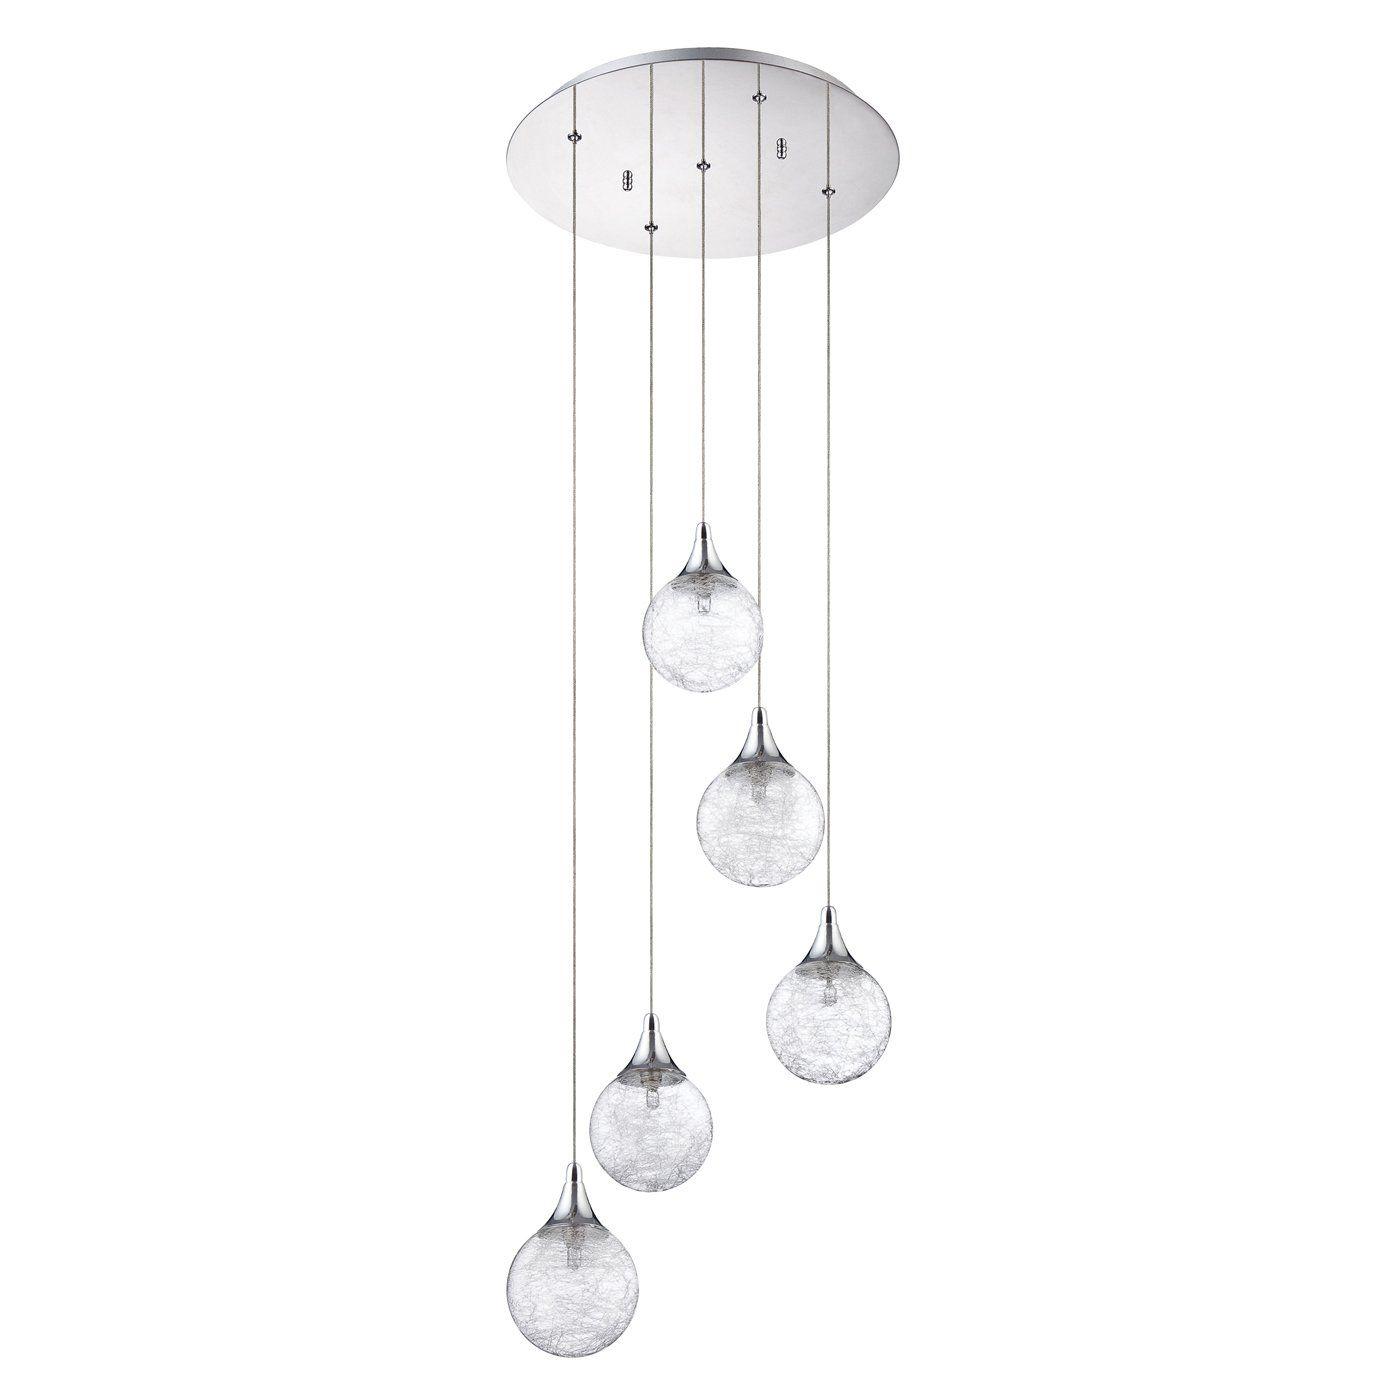 multi light pendant lighting. For The Stairwell Kendal Lighting PF41-5LPA-CH Multi Light Pendant | ATG Stores H